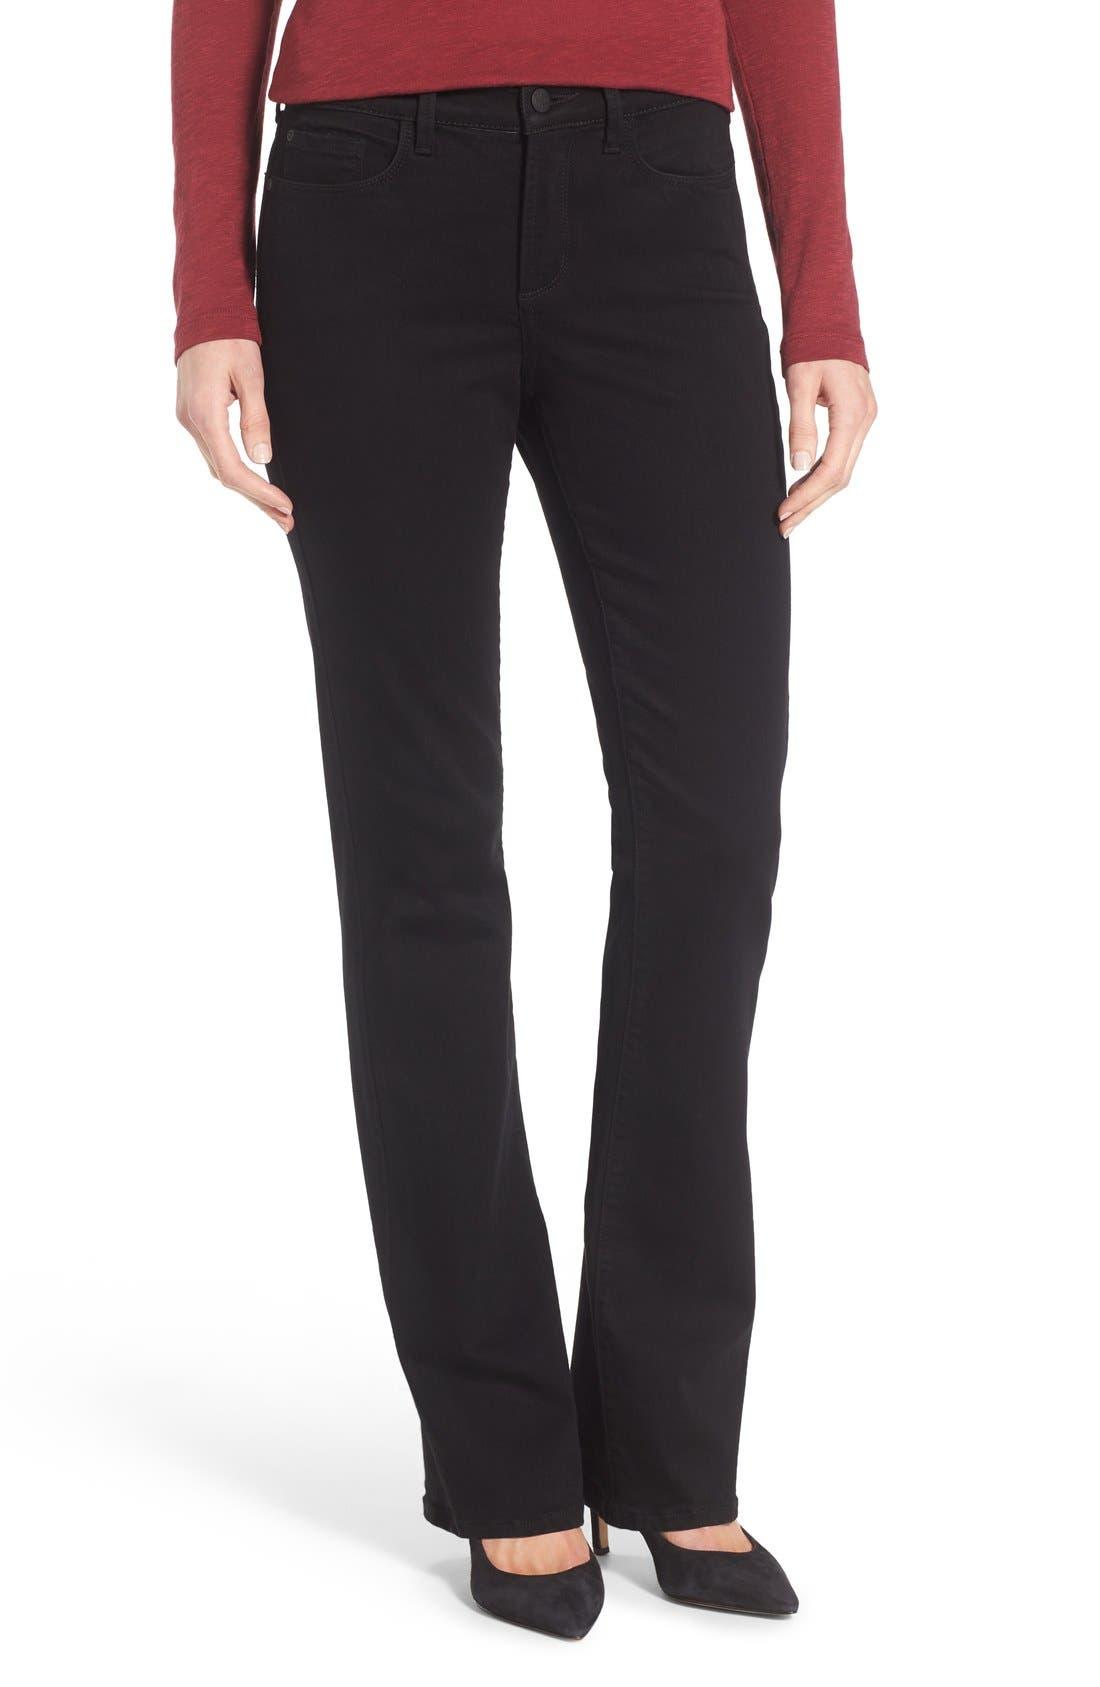 Main Image - NYDJ 'Barbara' Stretch Bootcut Jeans (Regular & Petite)